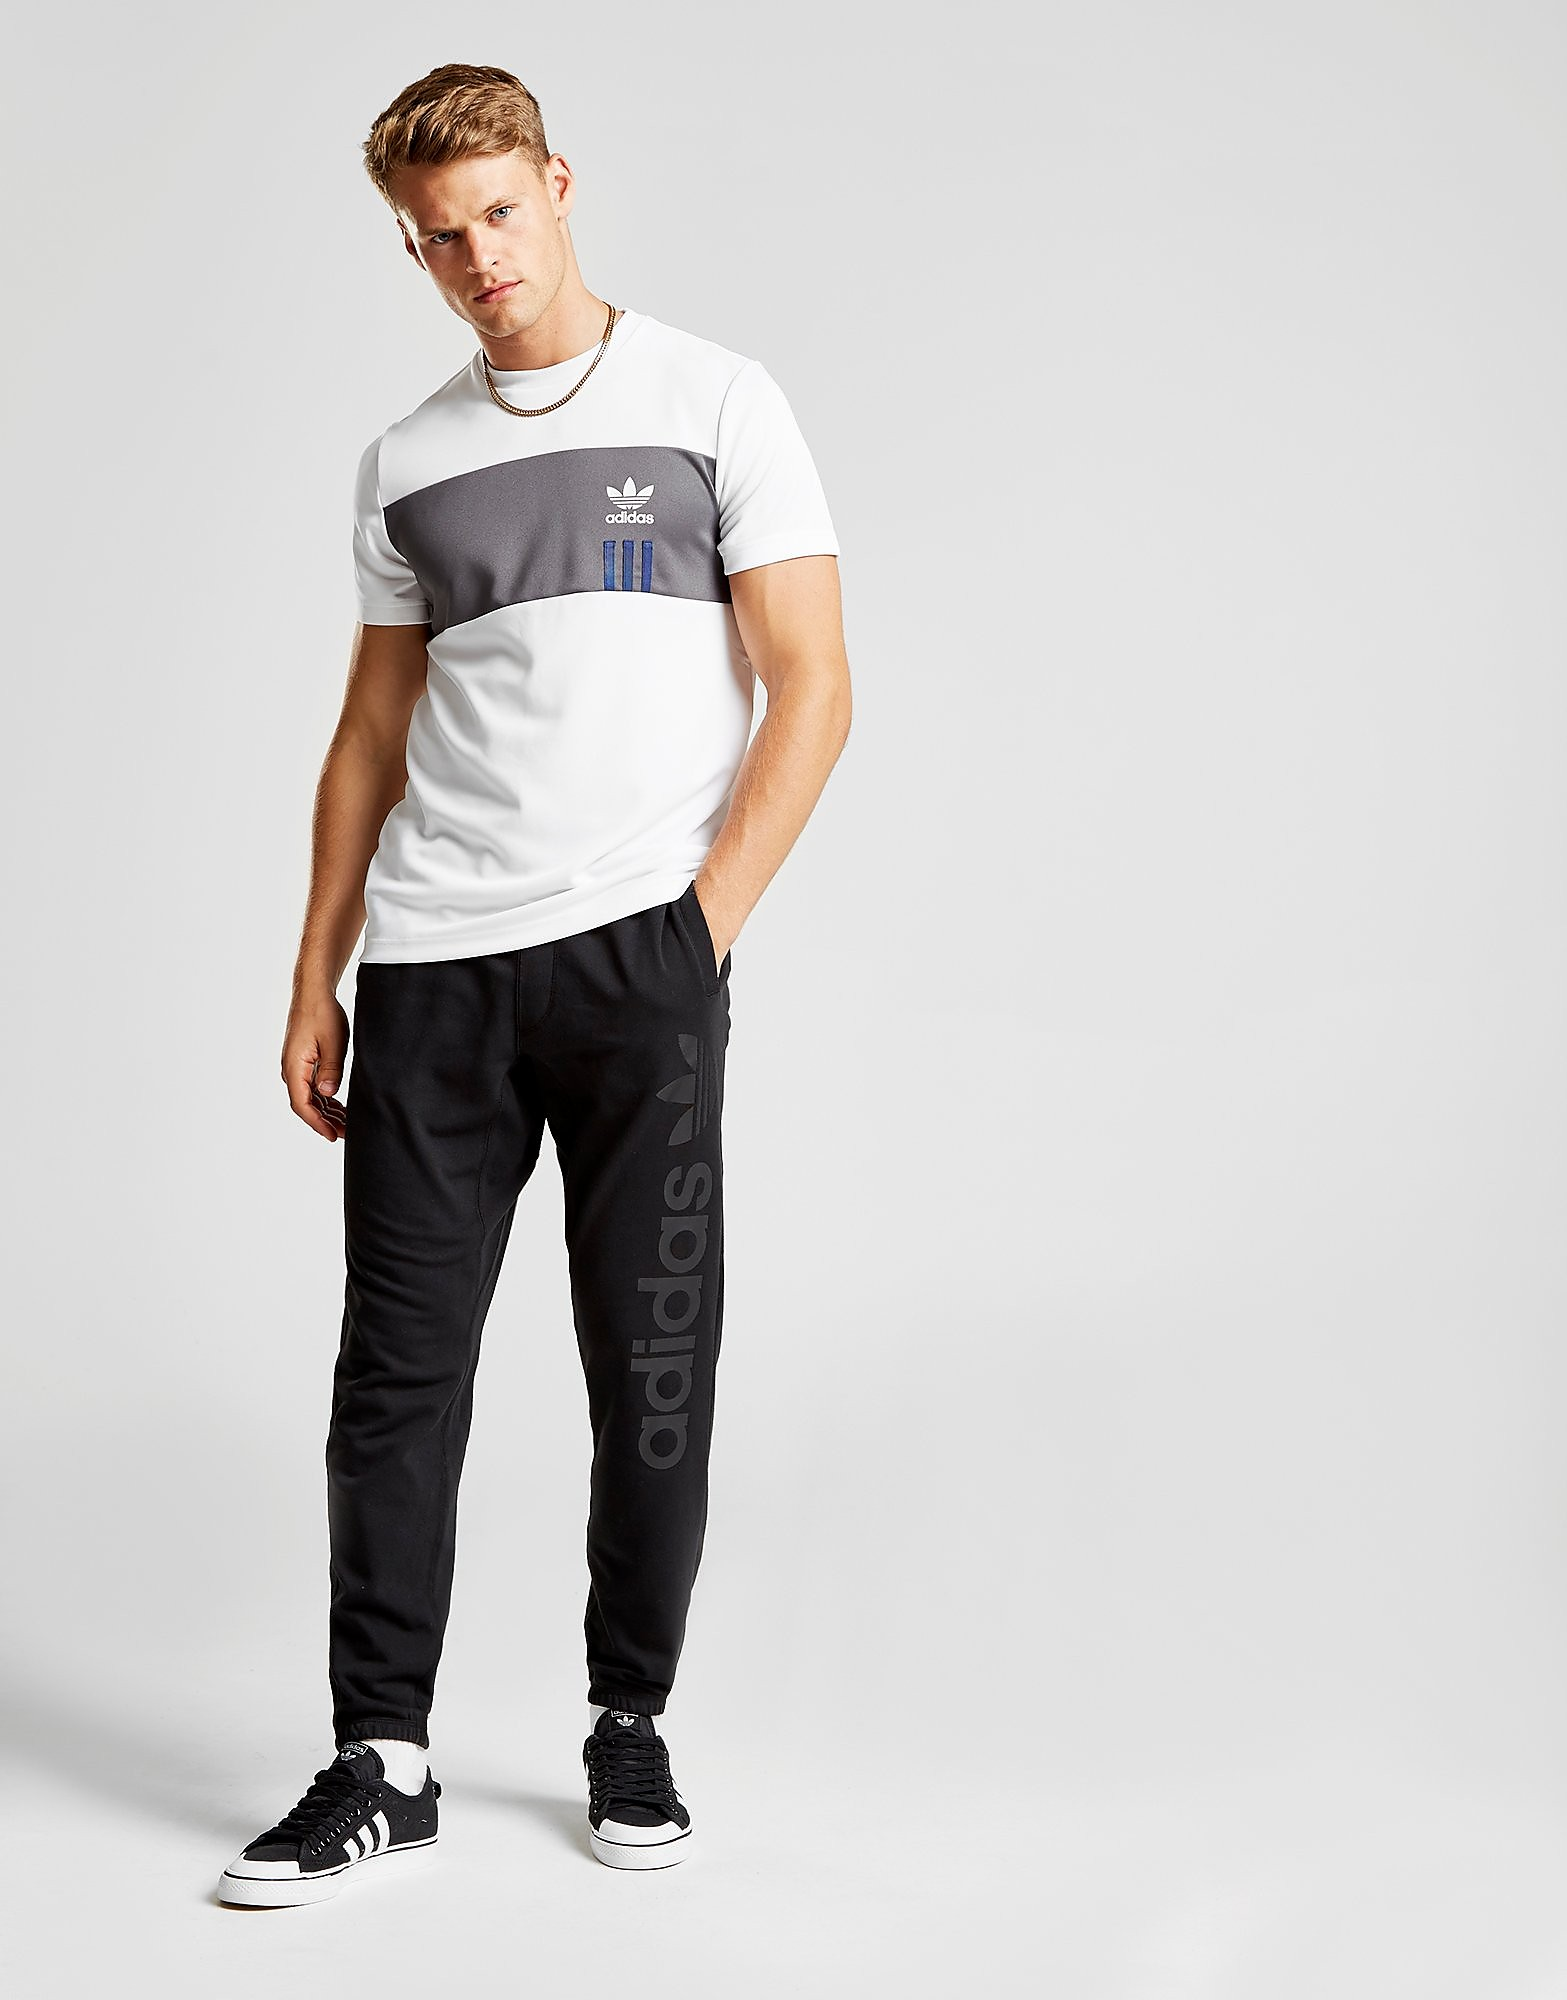 adidas Originals Skateboarding Tonal Linear Track Pants